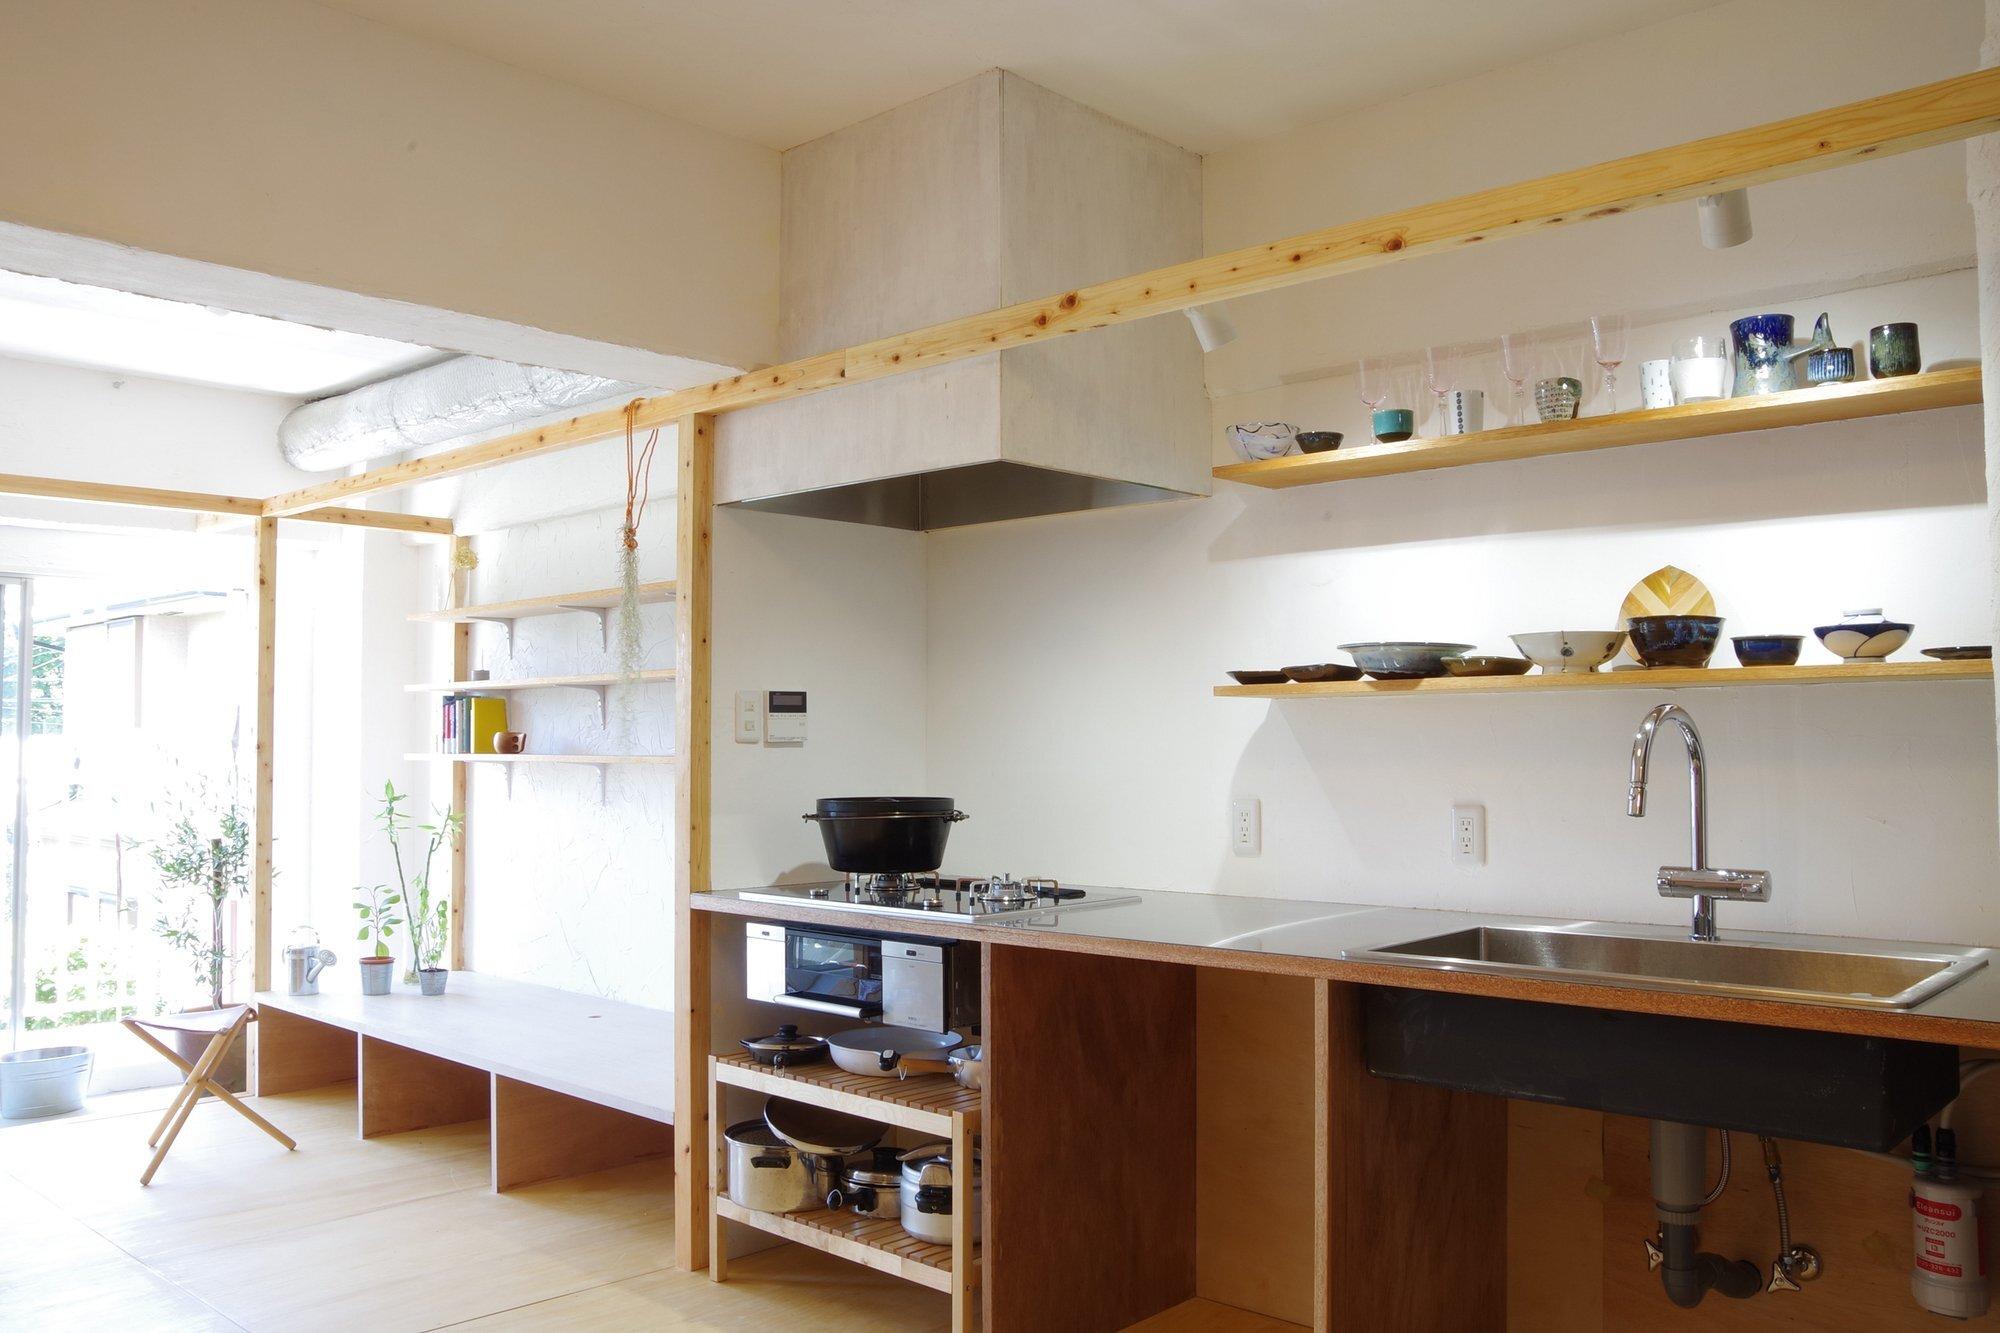 frame-house-peak-studio-kawasaki-japan-kitchen-humble-homes